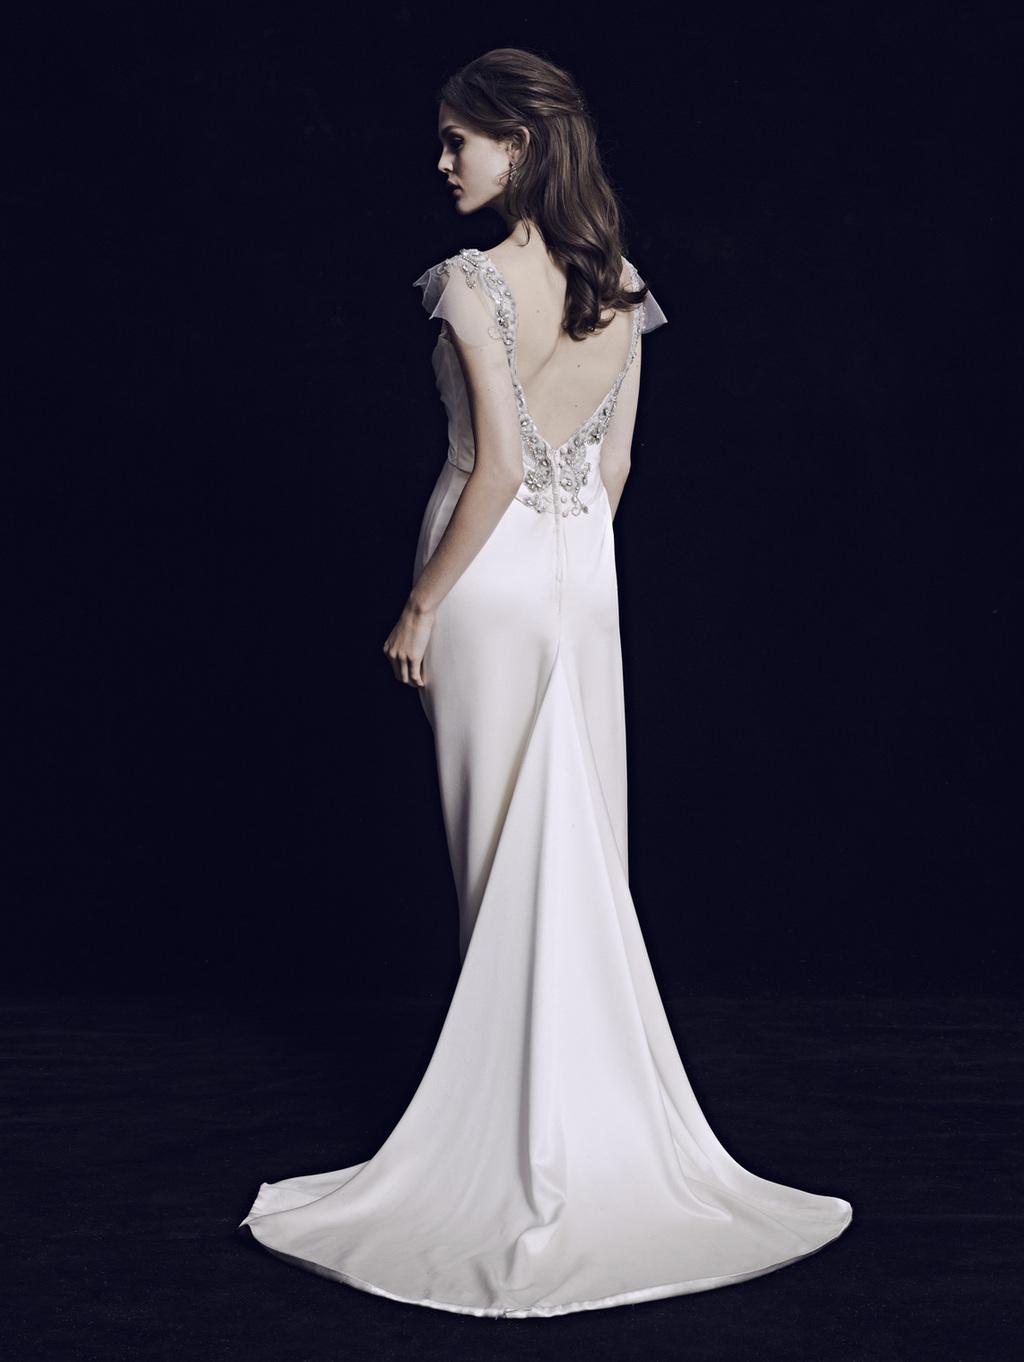 Mariana-hardwick-wedding-dress-2013-bridal-classic-4.full